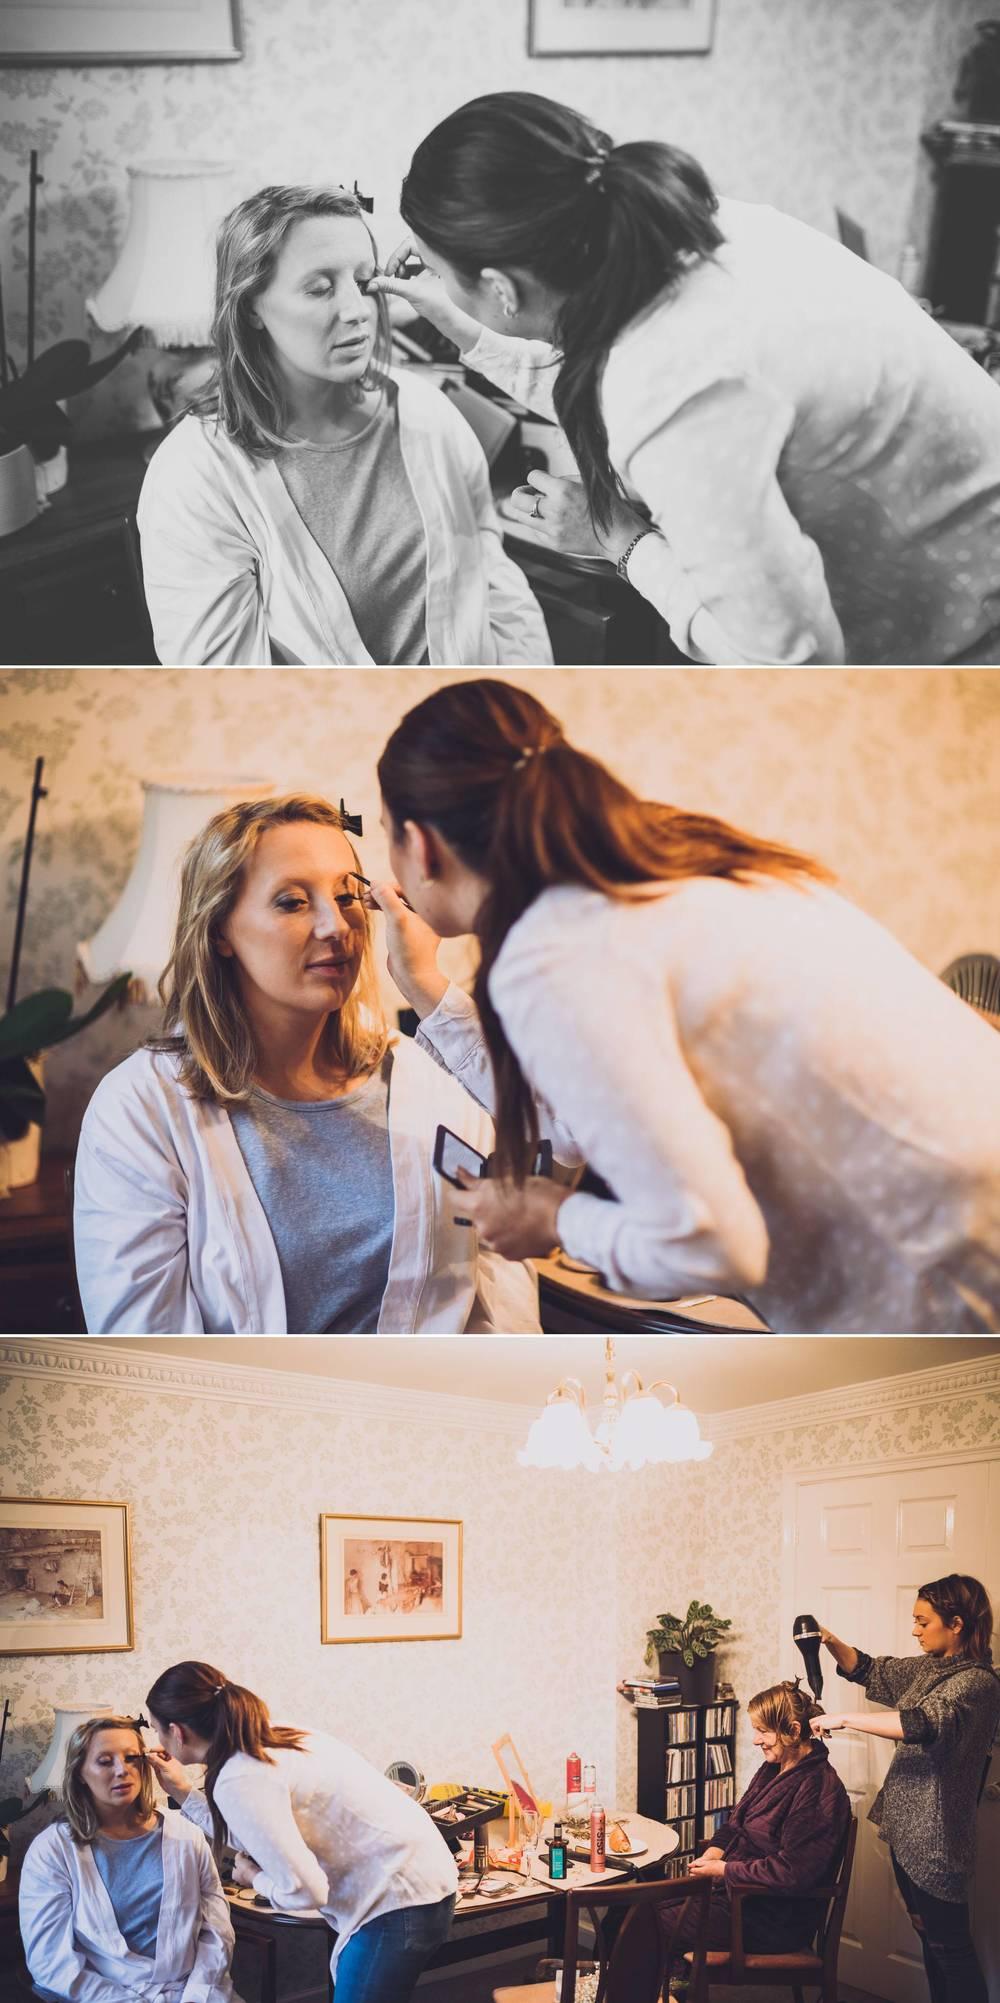 wedding-photographer-staffordshire 1.jpg